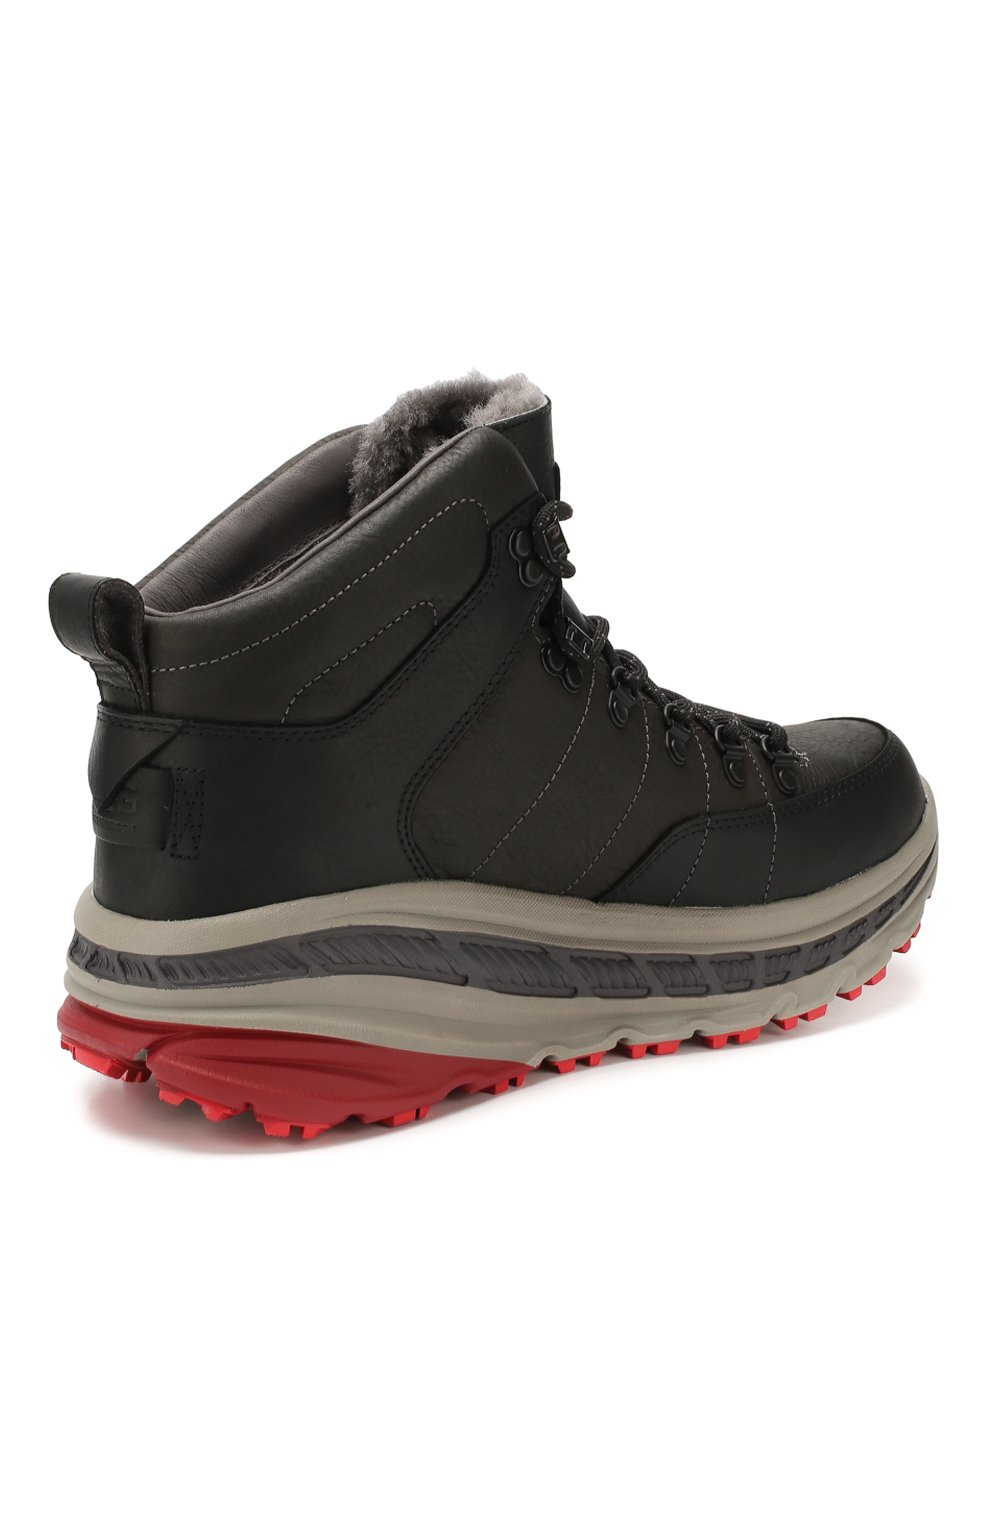 Мужские кожаные ботинки ugg x white mountaineering 805 hiker UGG черного цвета, арт. 1108650_BLK   Фото 4